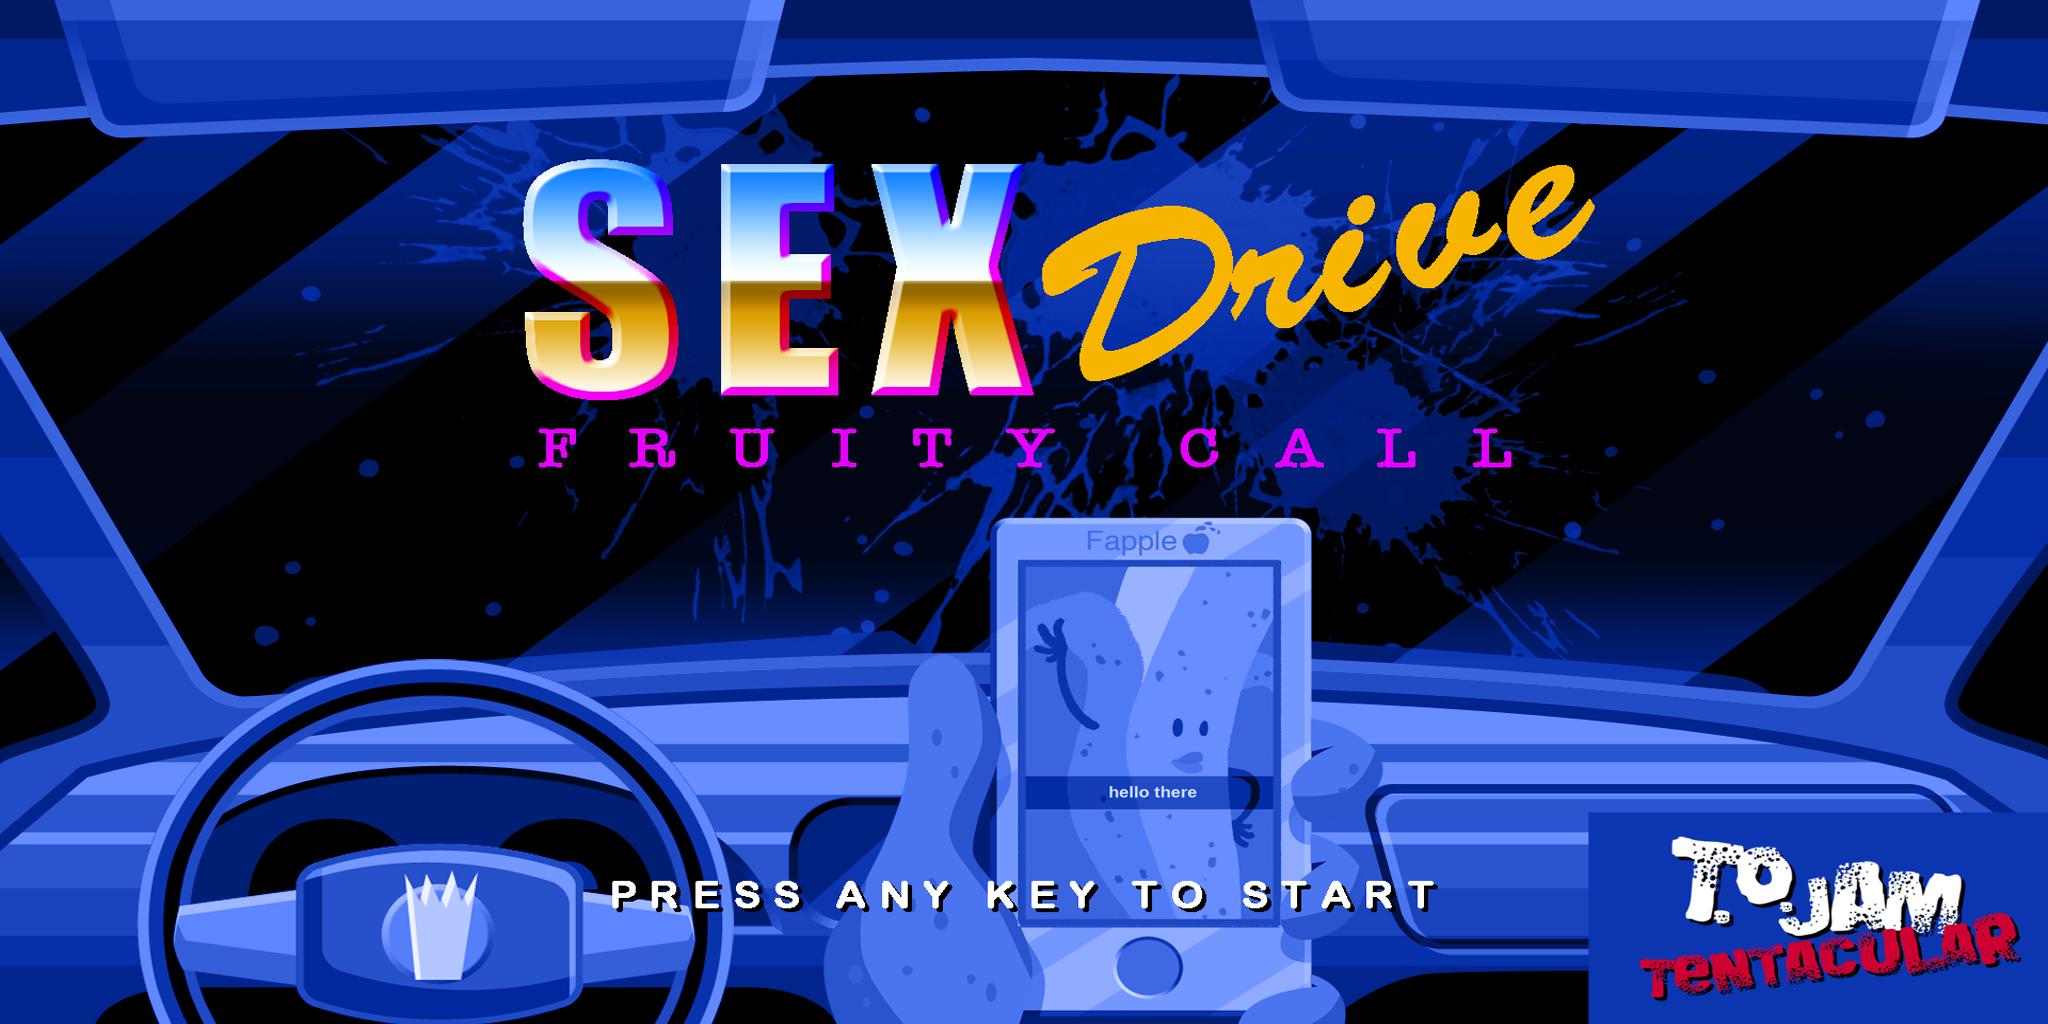 Download Download Sex Pretty sex drive (tojam edition)royal papaya!